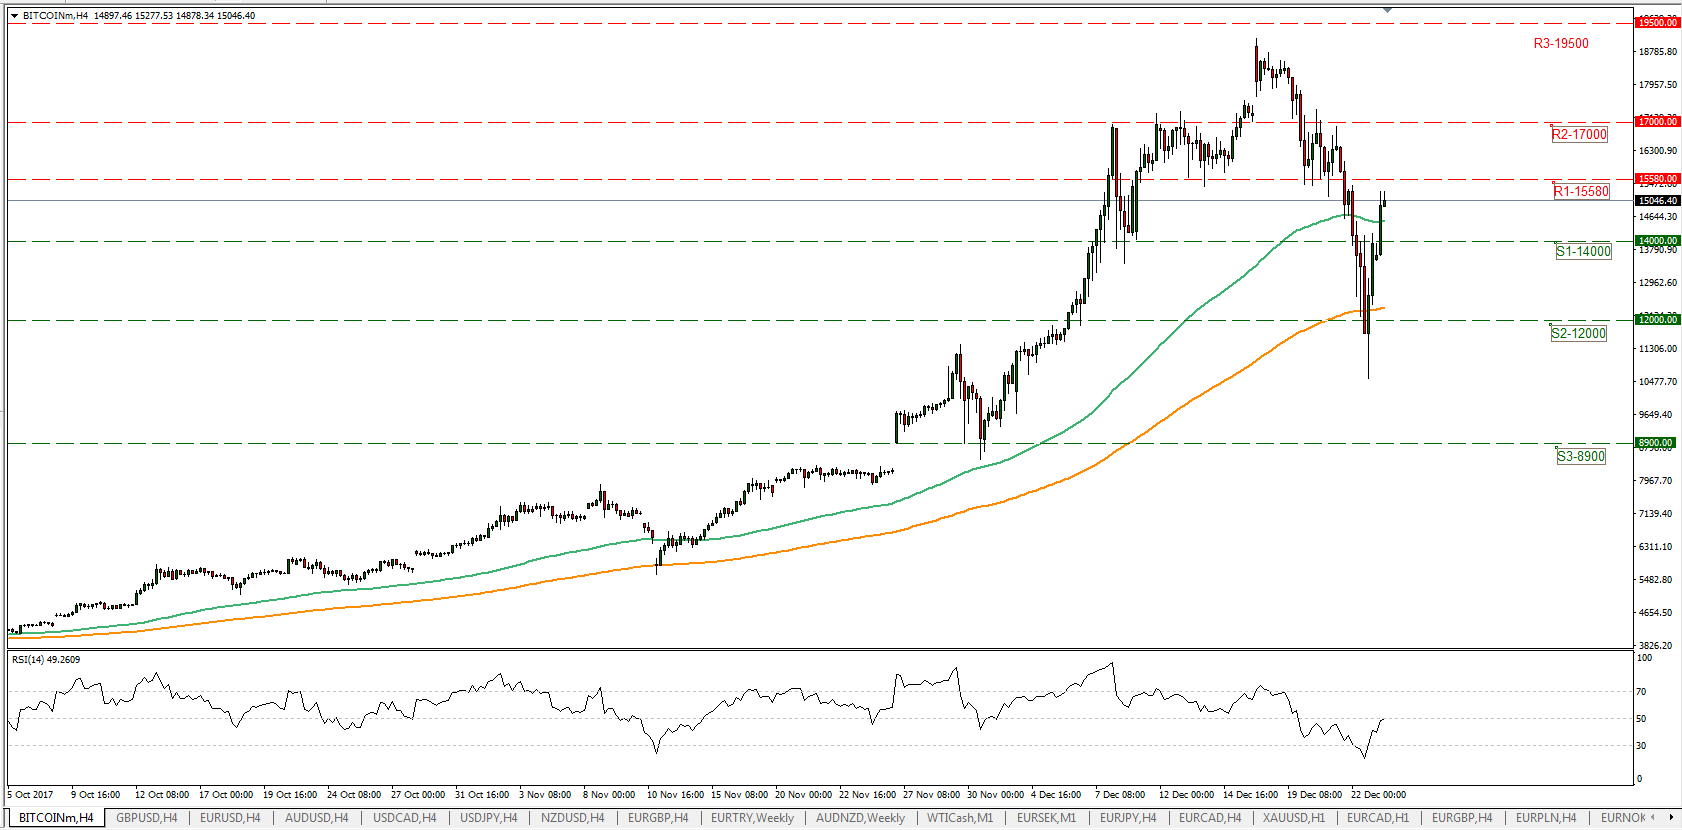 BTC/USD 26/12/2017 | Econ Alerts